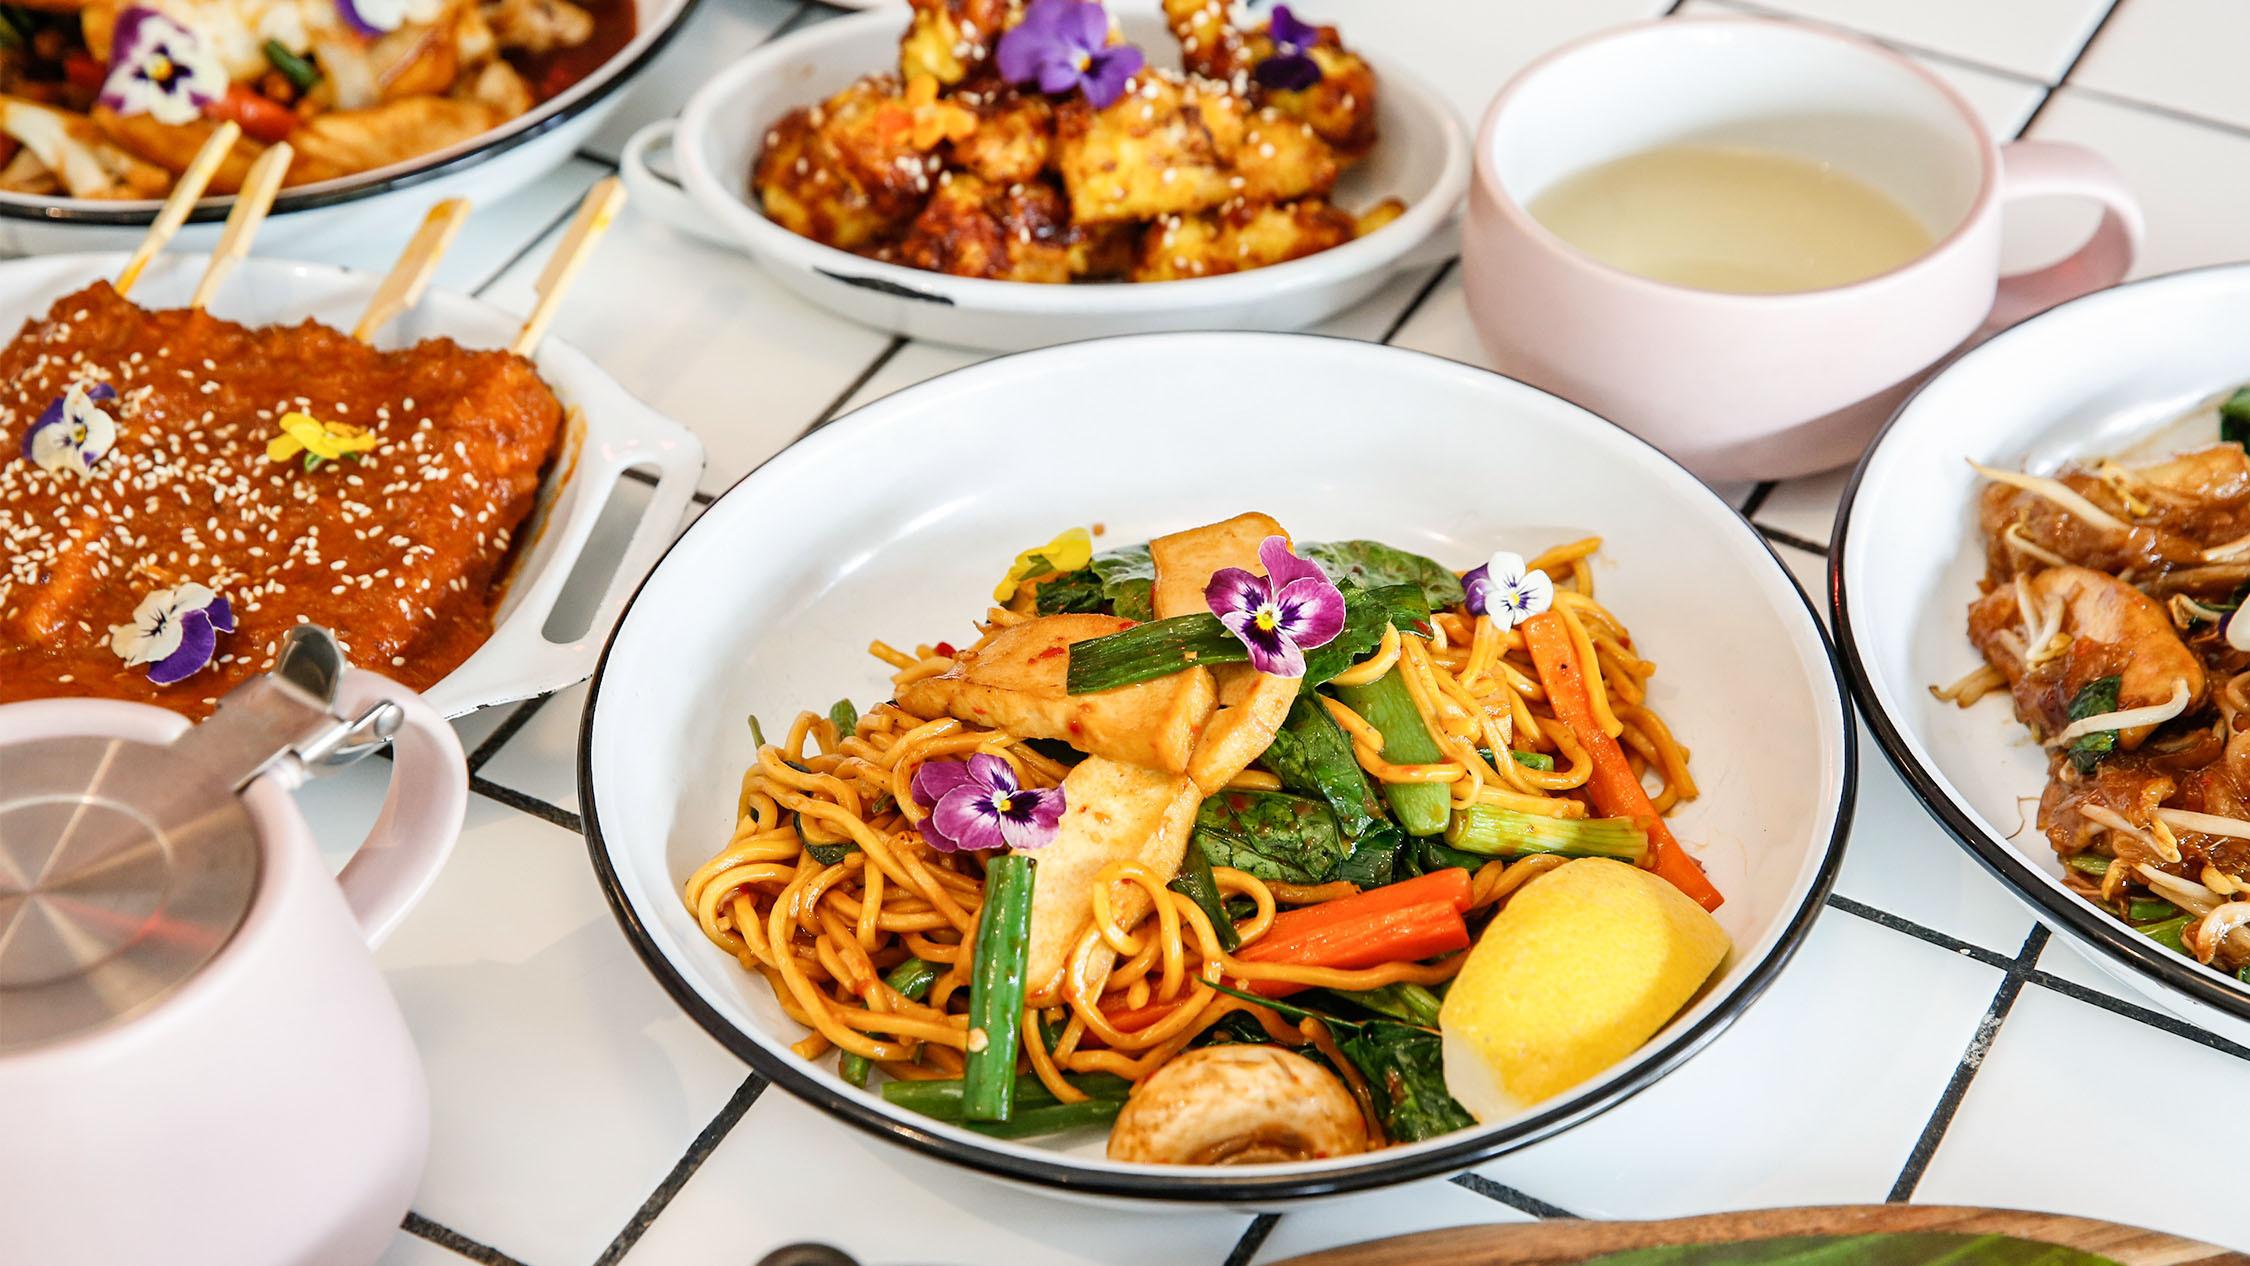 16 of the best vegan restaurants in Sydney